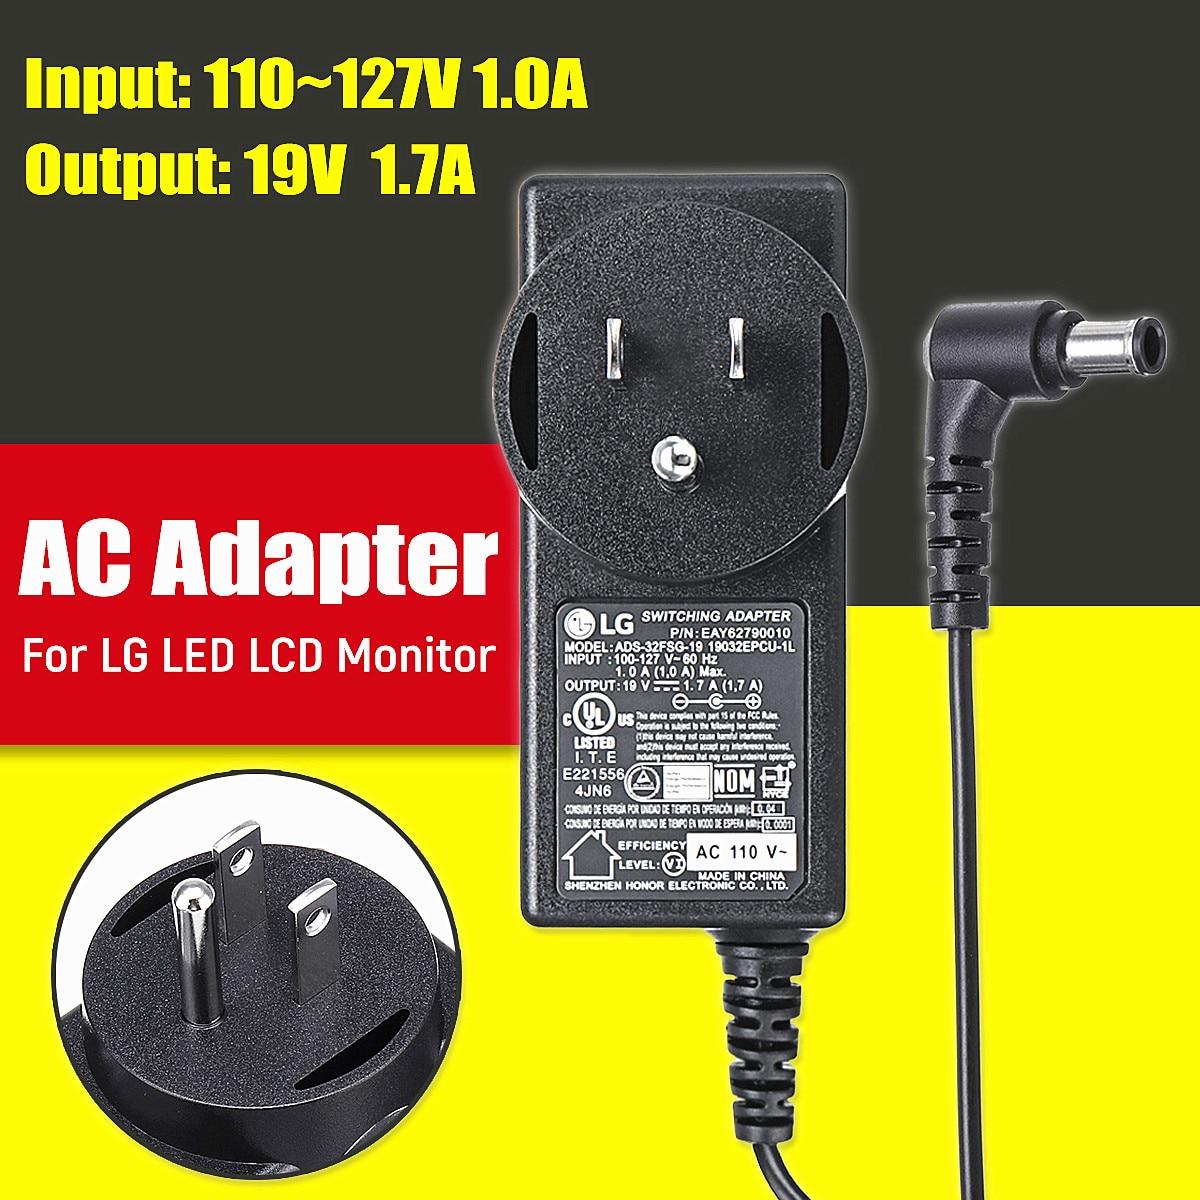 LG LED LCD Monitor AC Adapter Power Supply 19V 1.7A US Plug ...